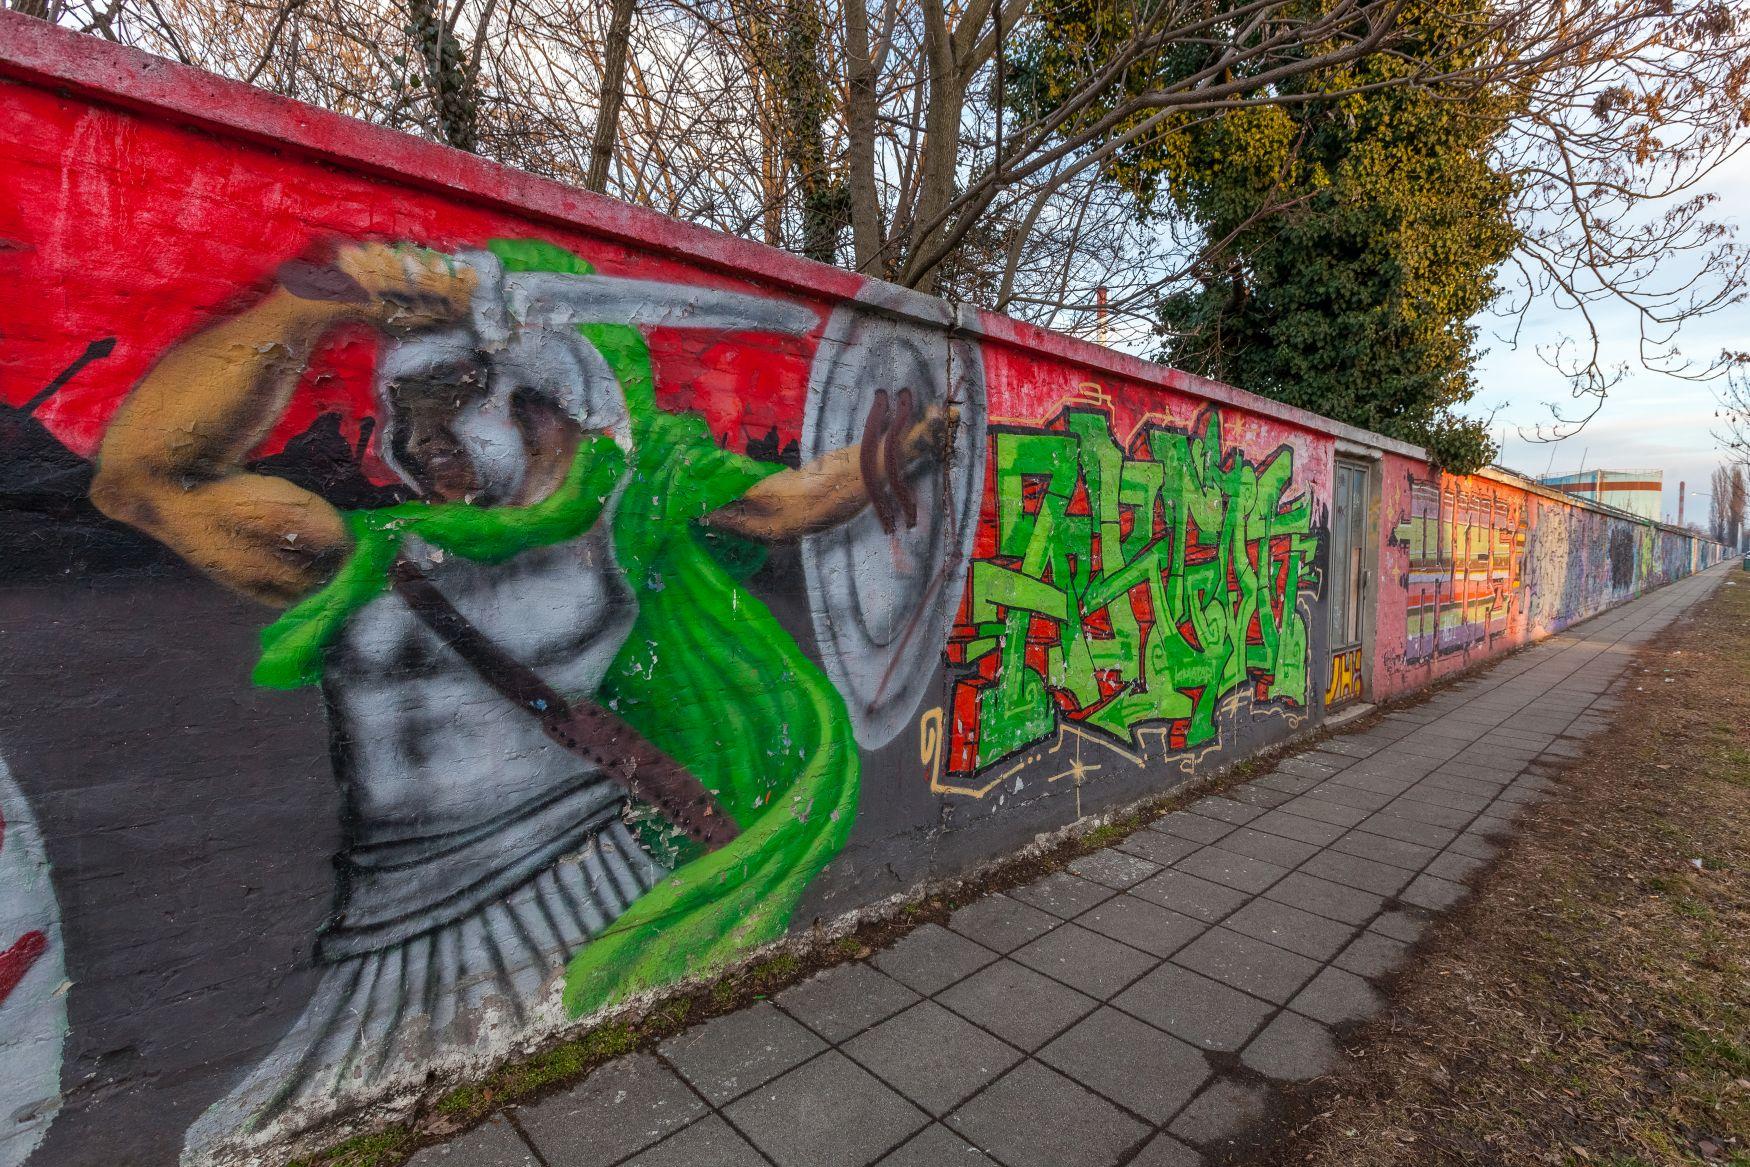 URBAN ART AND GRAFFITI WORKSHOP